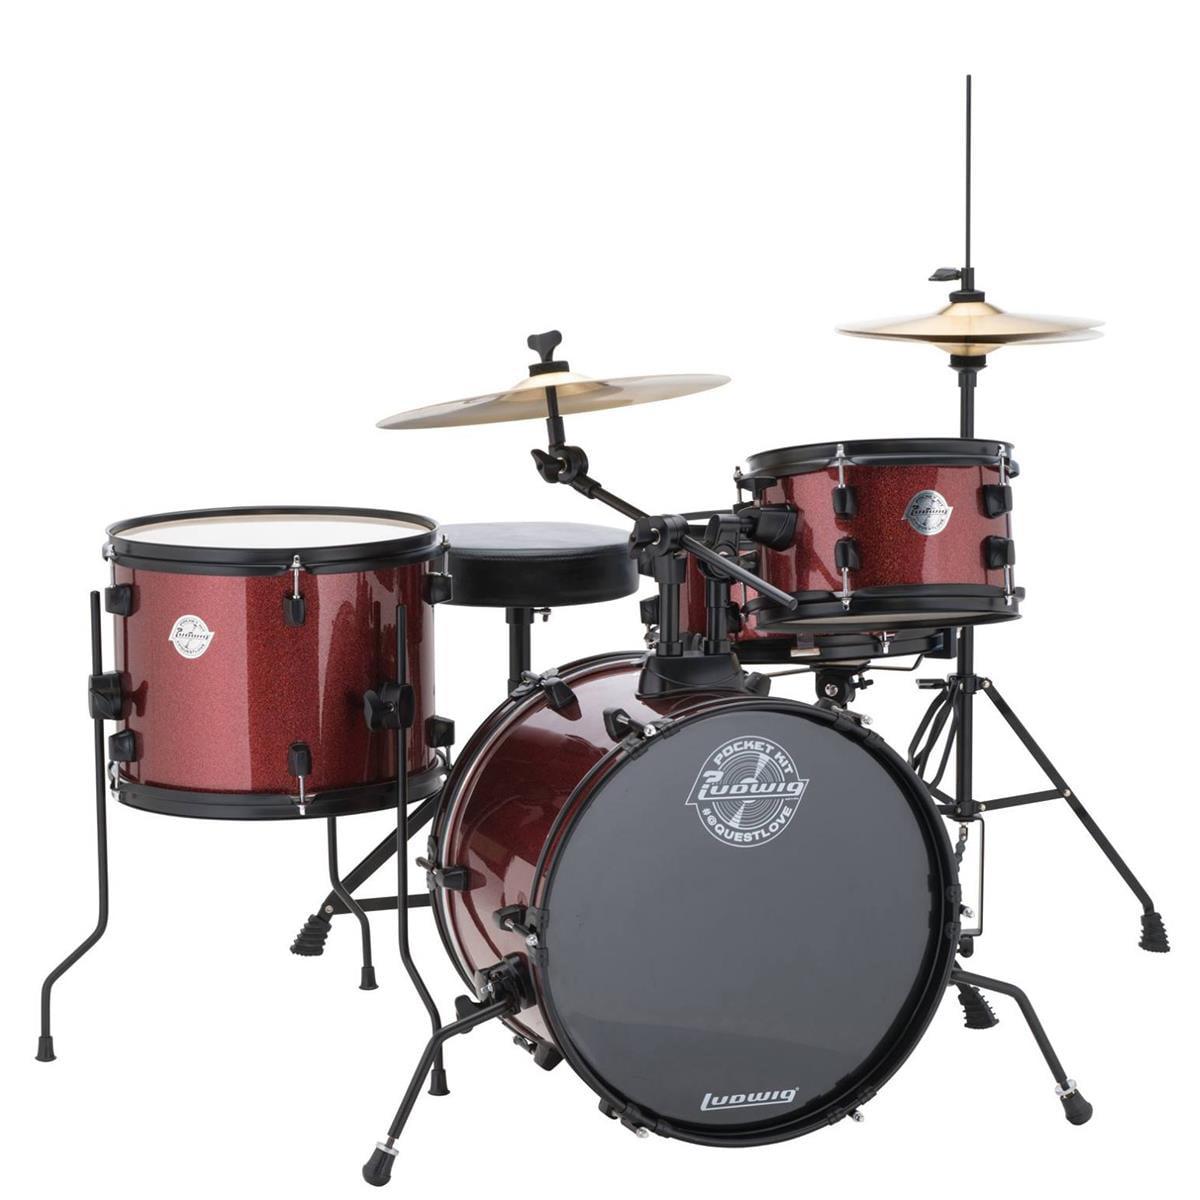 Ludwig LC178X025 Questlove Pocket Kit 4-Piece Drum Set - Red Wine Sparkle